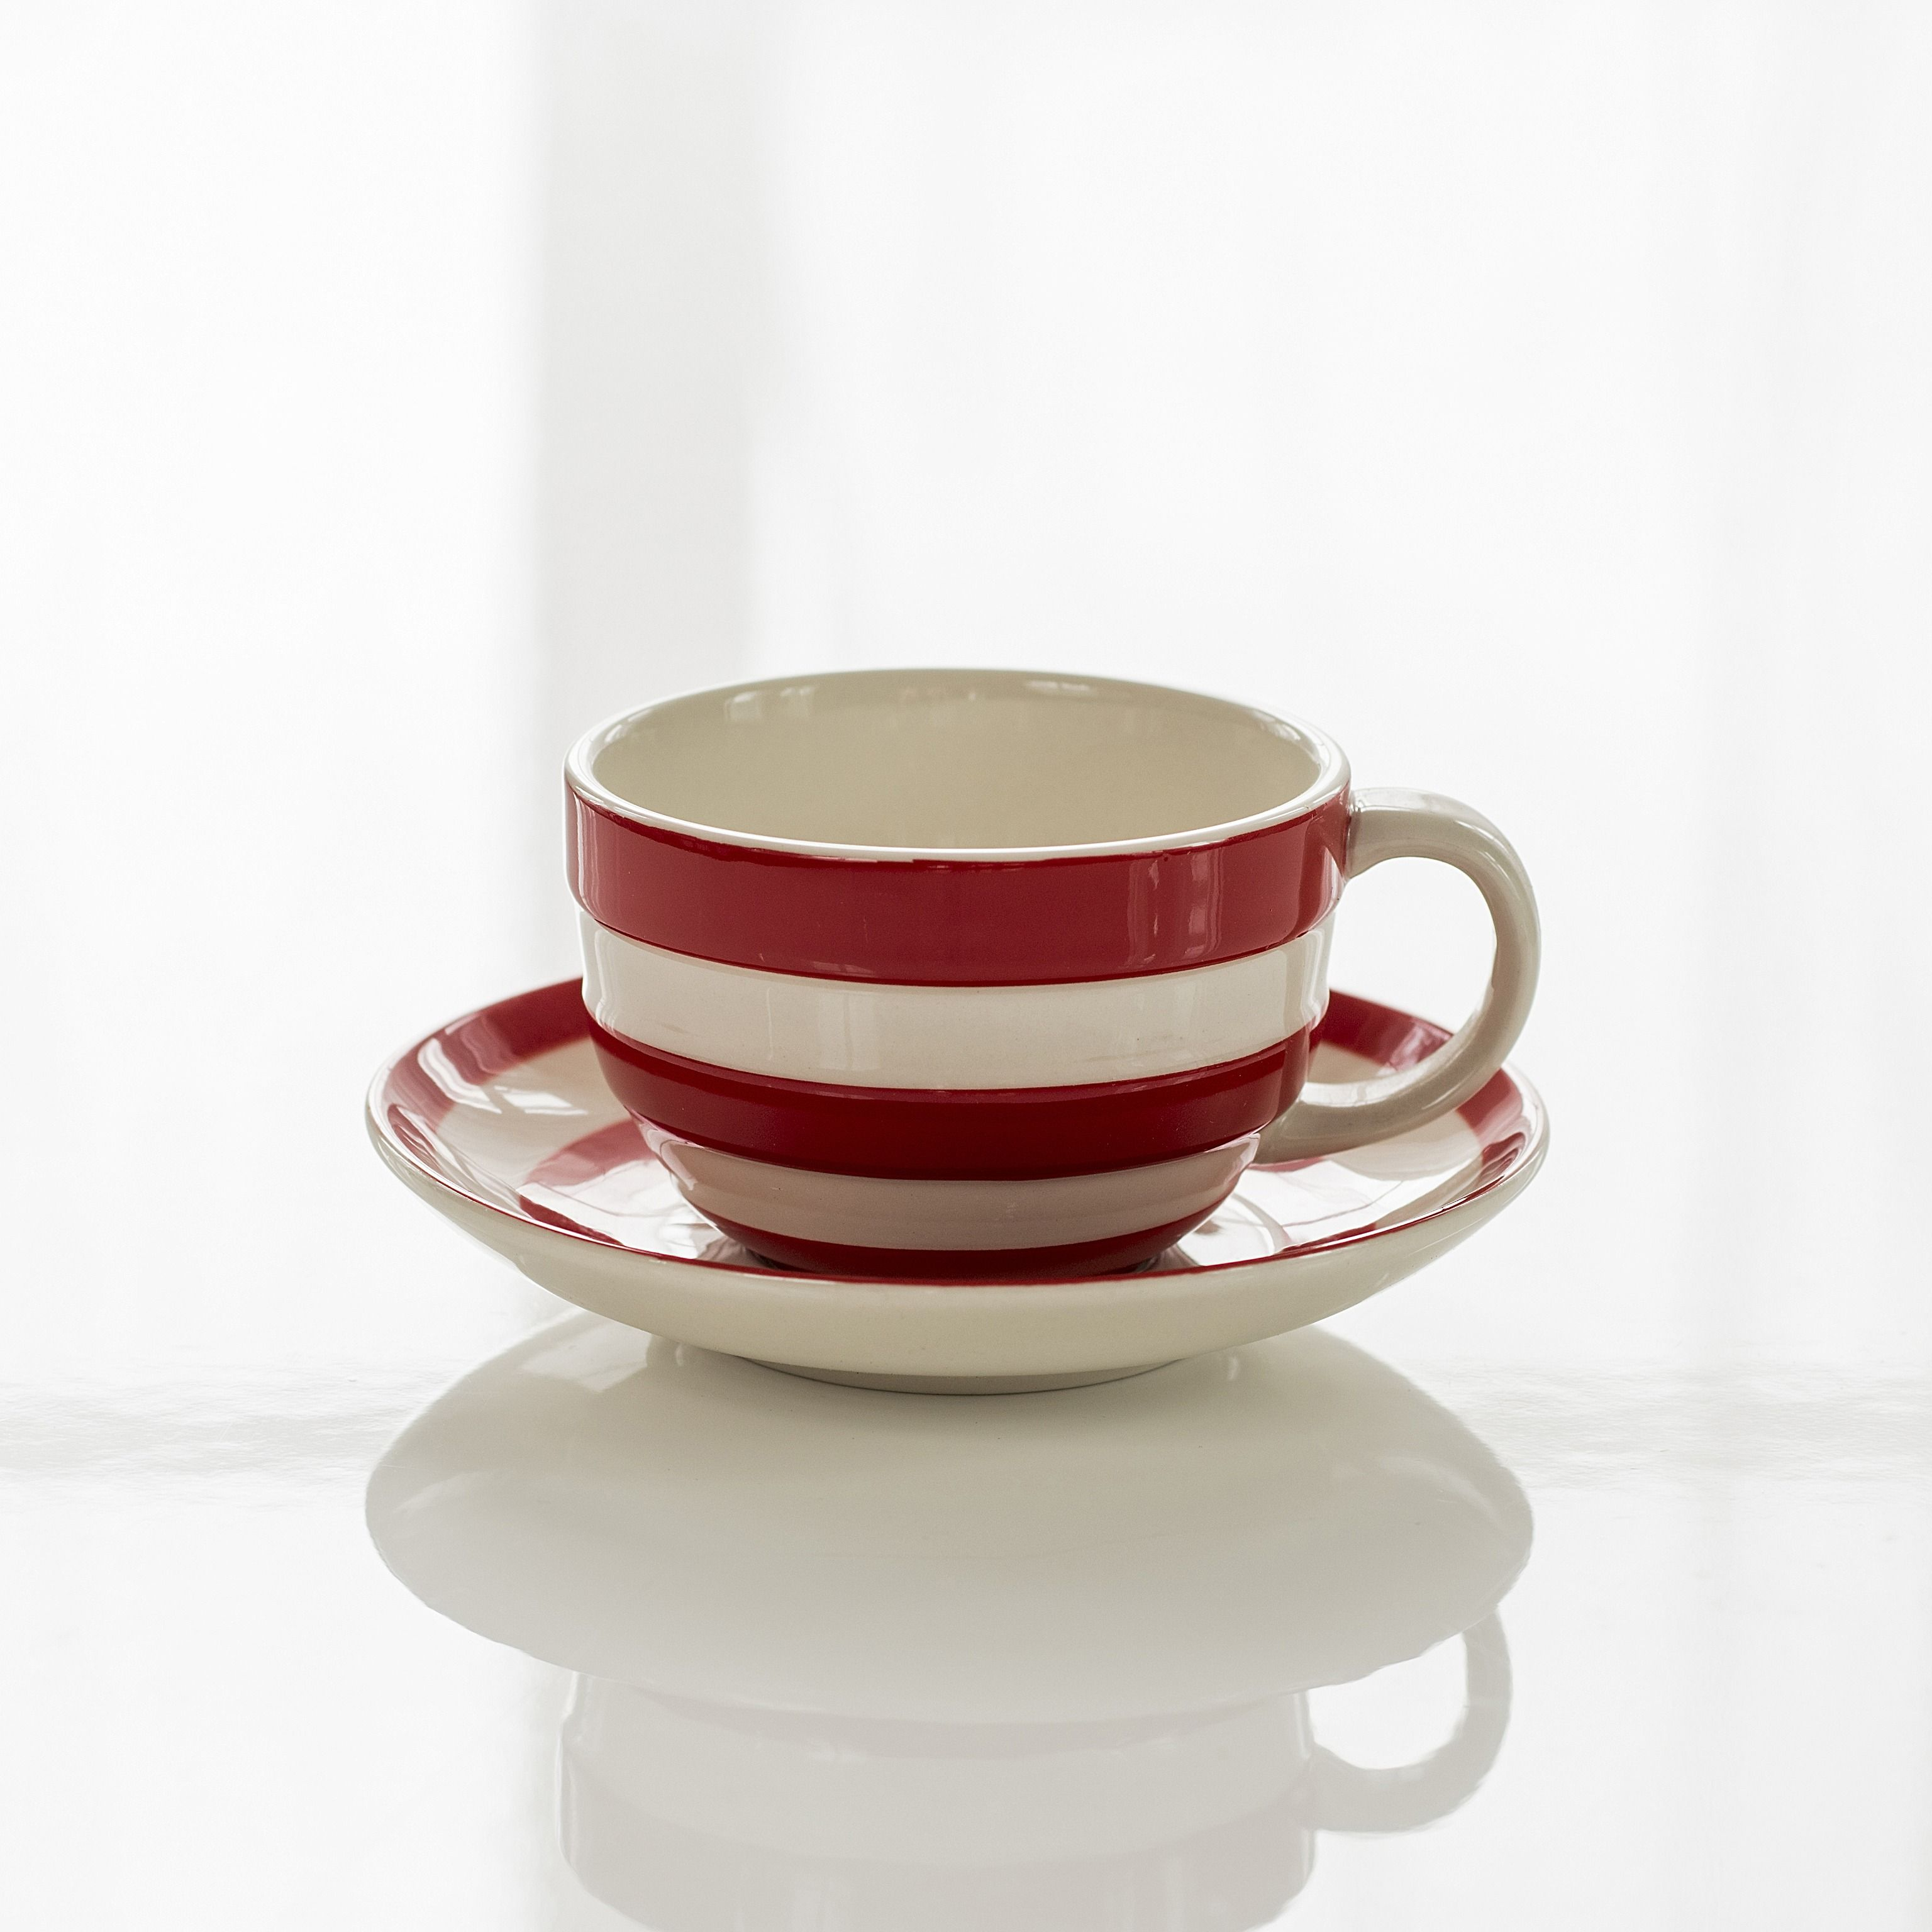 4 cappuccino tassen cornishware rot bei. Black Bedroom Furniture Sets. Home Design Ideas